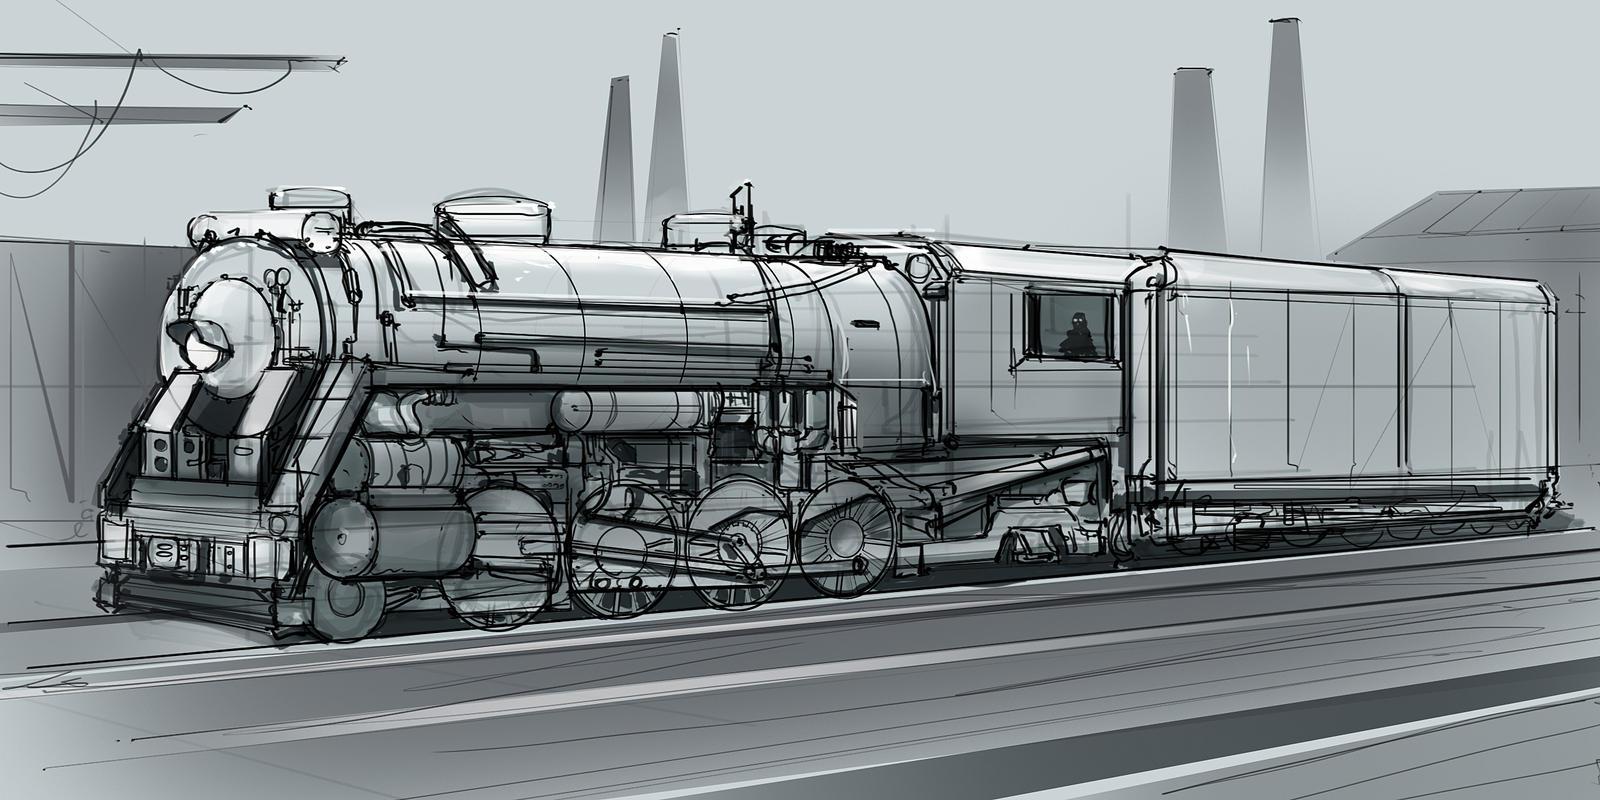 CoffePainting: Steam locomotive sketch by MacRebisz on ...